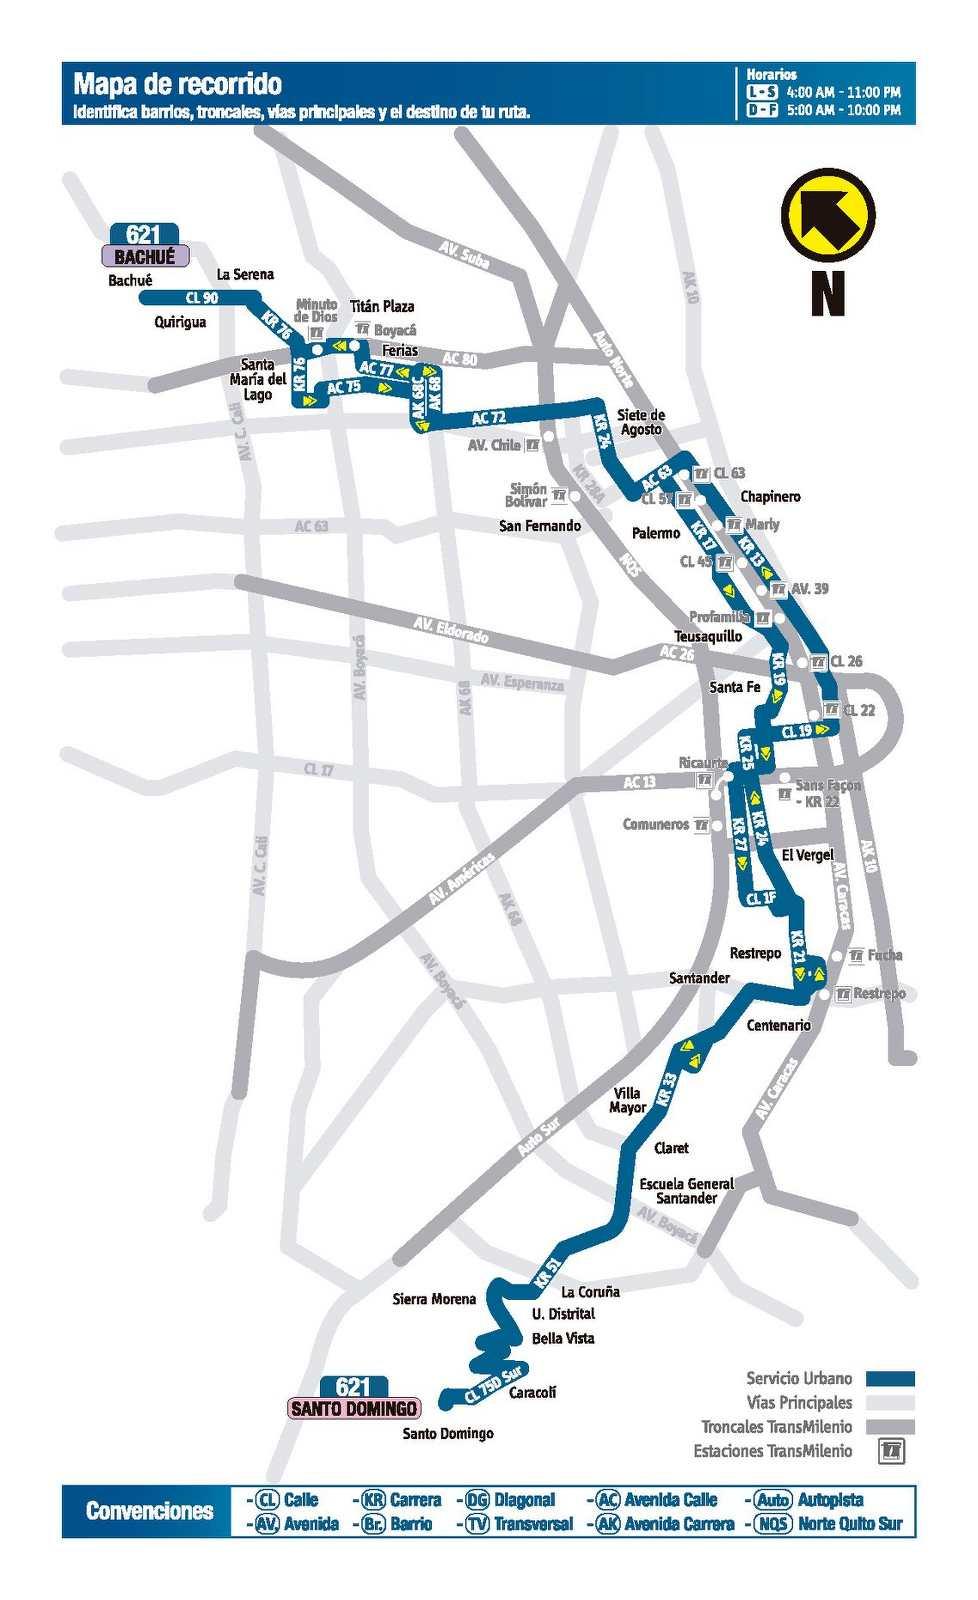 Ruta SITP: 621 Bachué ↔ Santo Domingo (mapa)